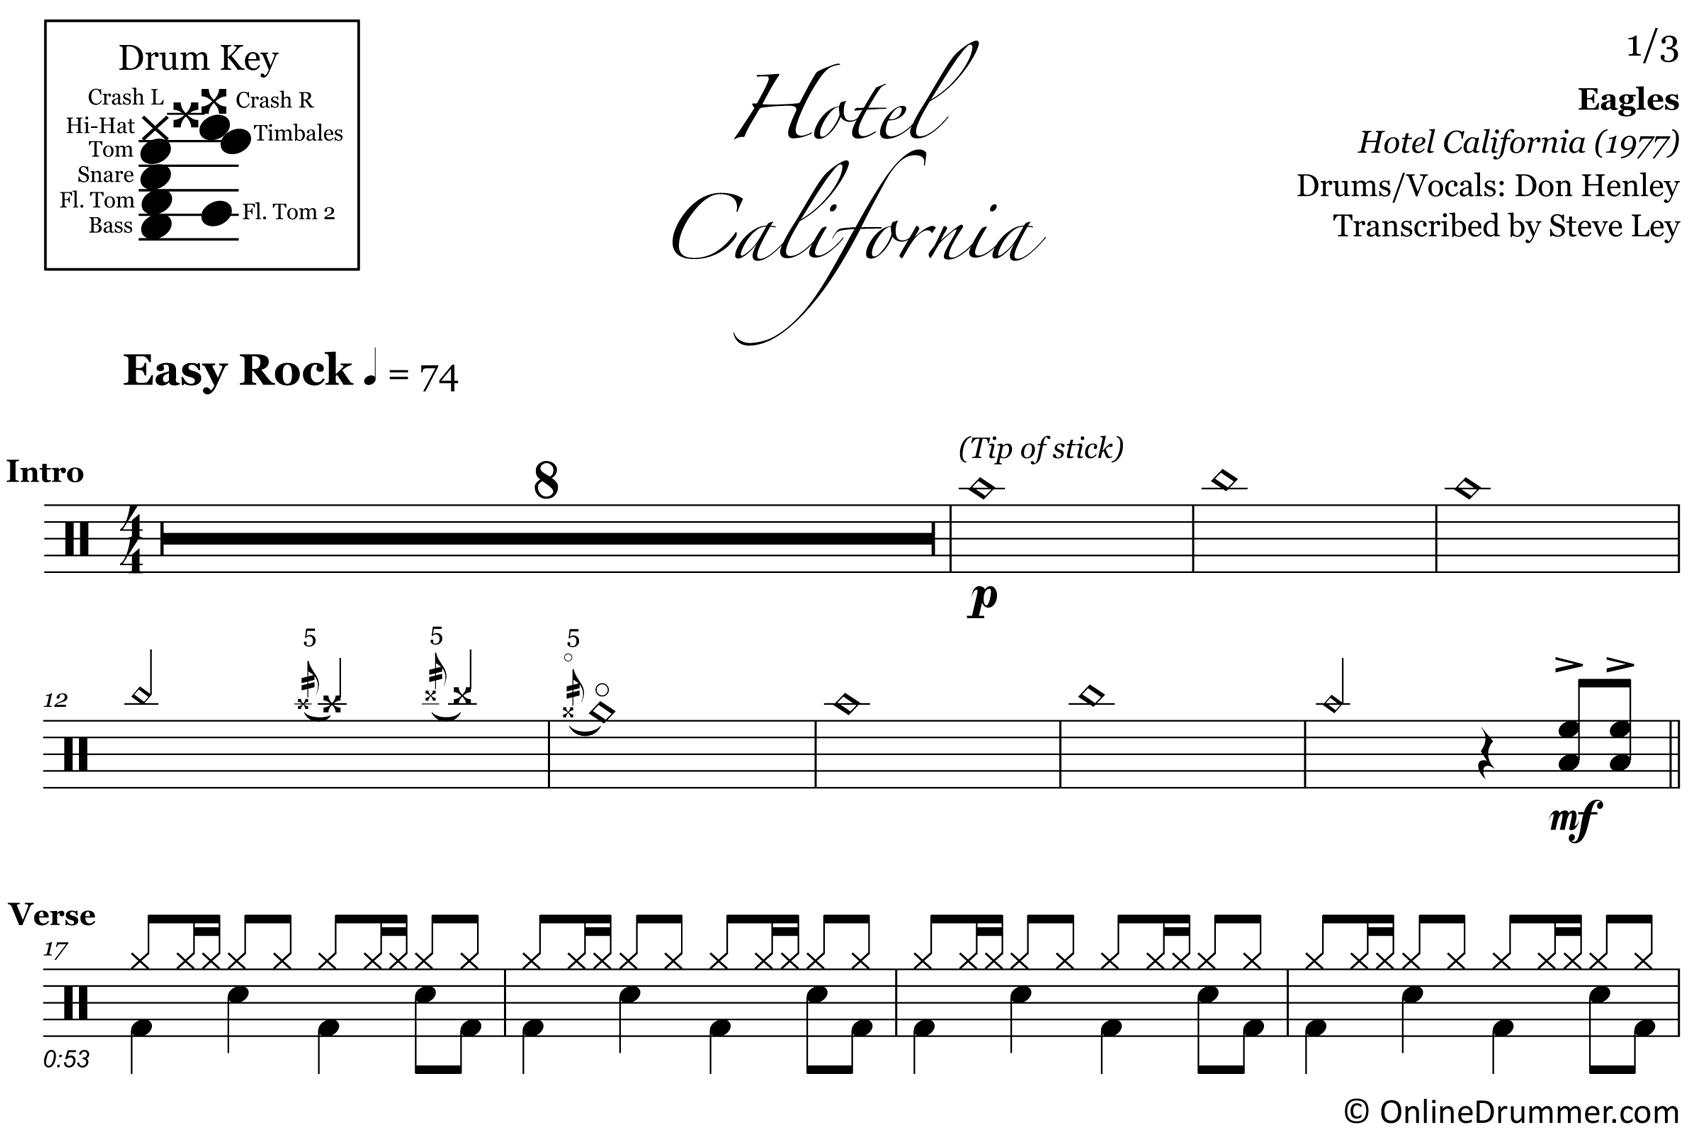 Hotel California - Eagles - Drum Sheet Music